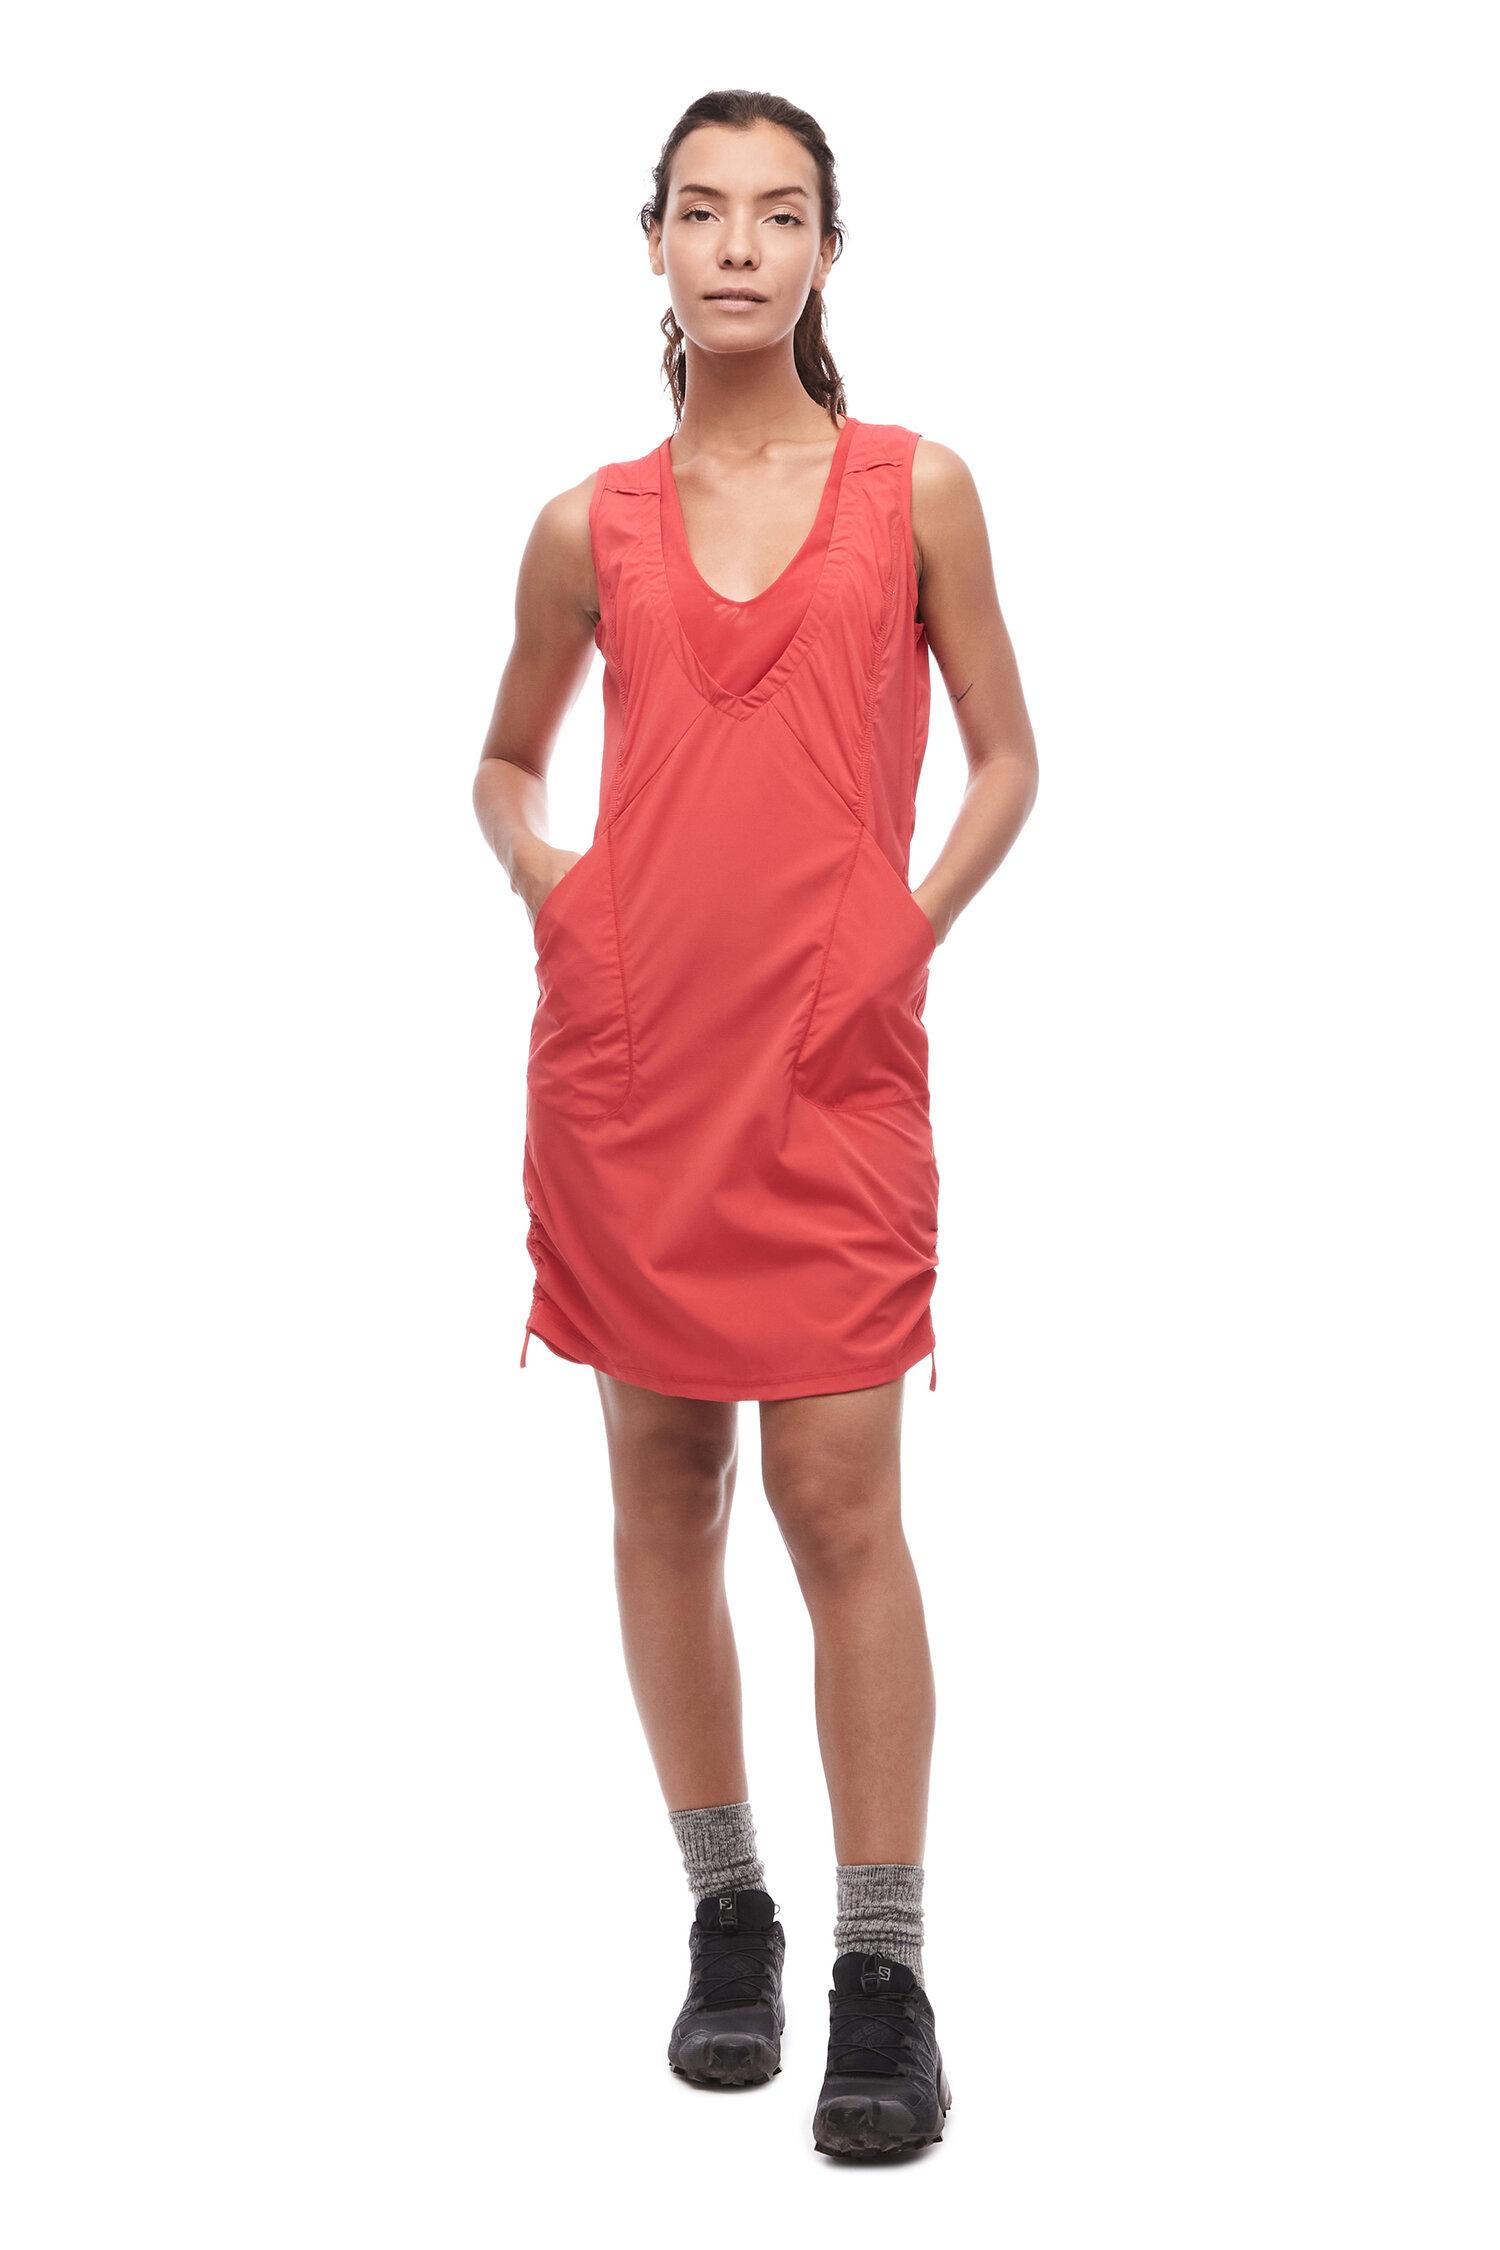 Indyva LIIKE III Dress Review - Surprise Favorite 1